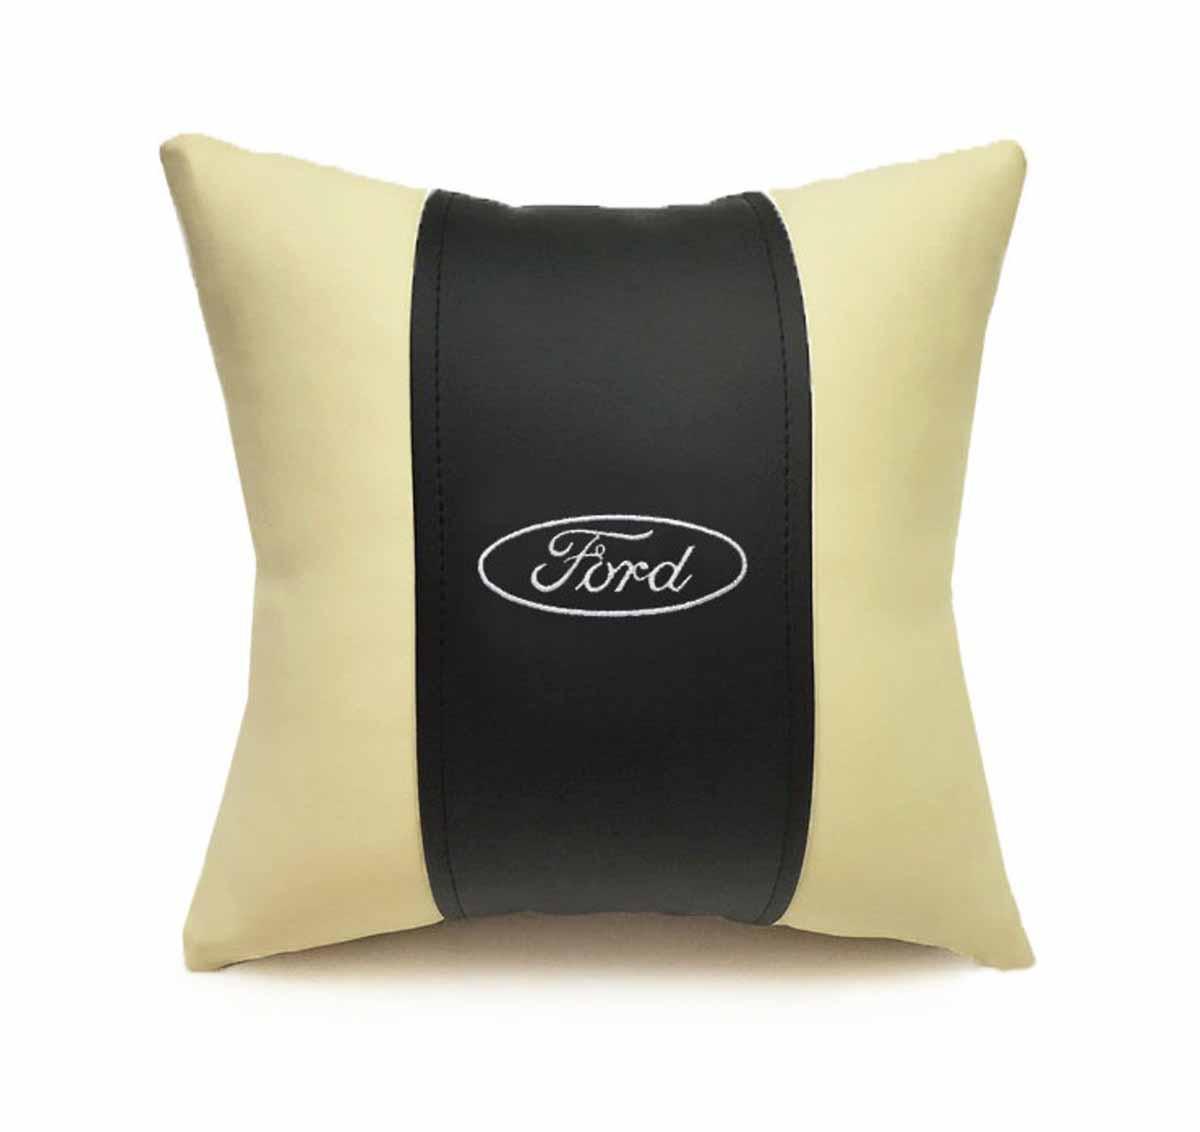 термосумка auto premium ford 20 л Подушка декоративная Auto premium Ford, цвет: черный, бежевый